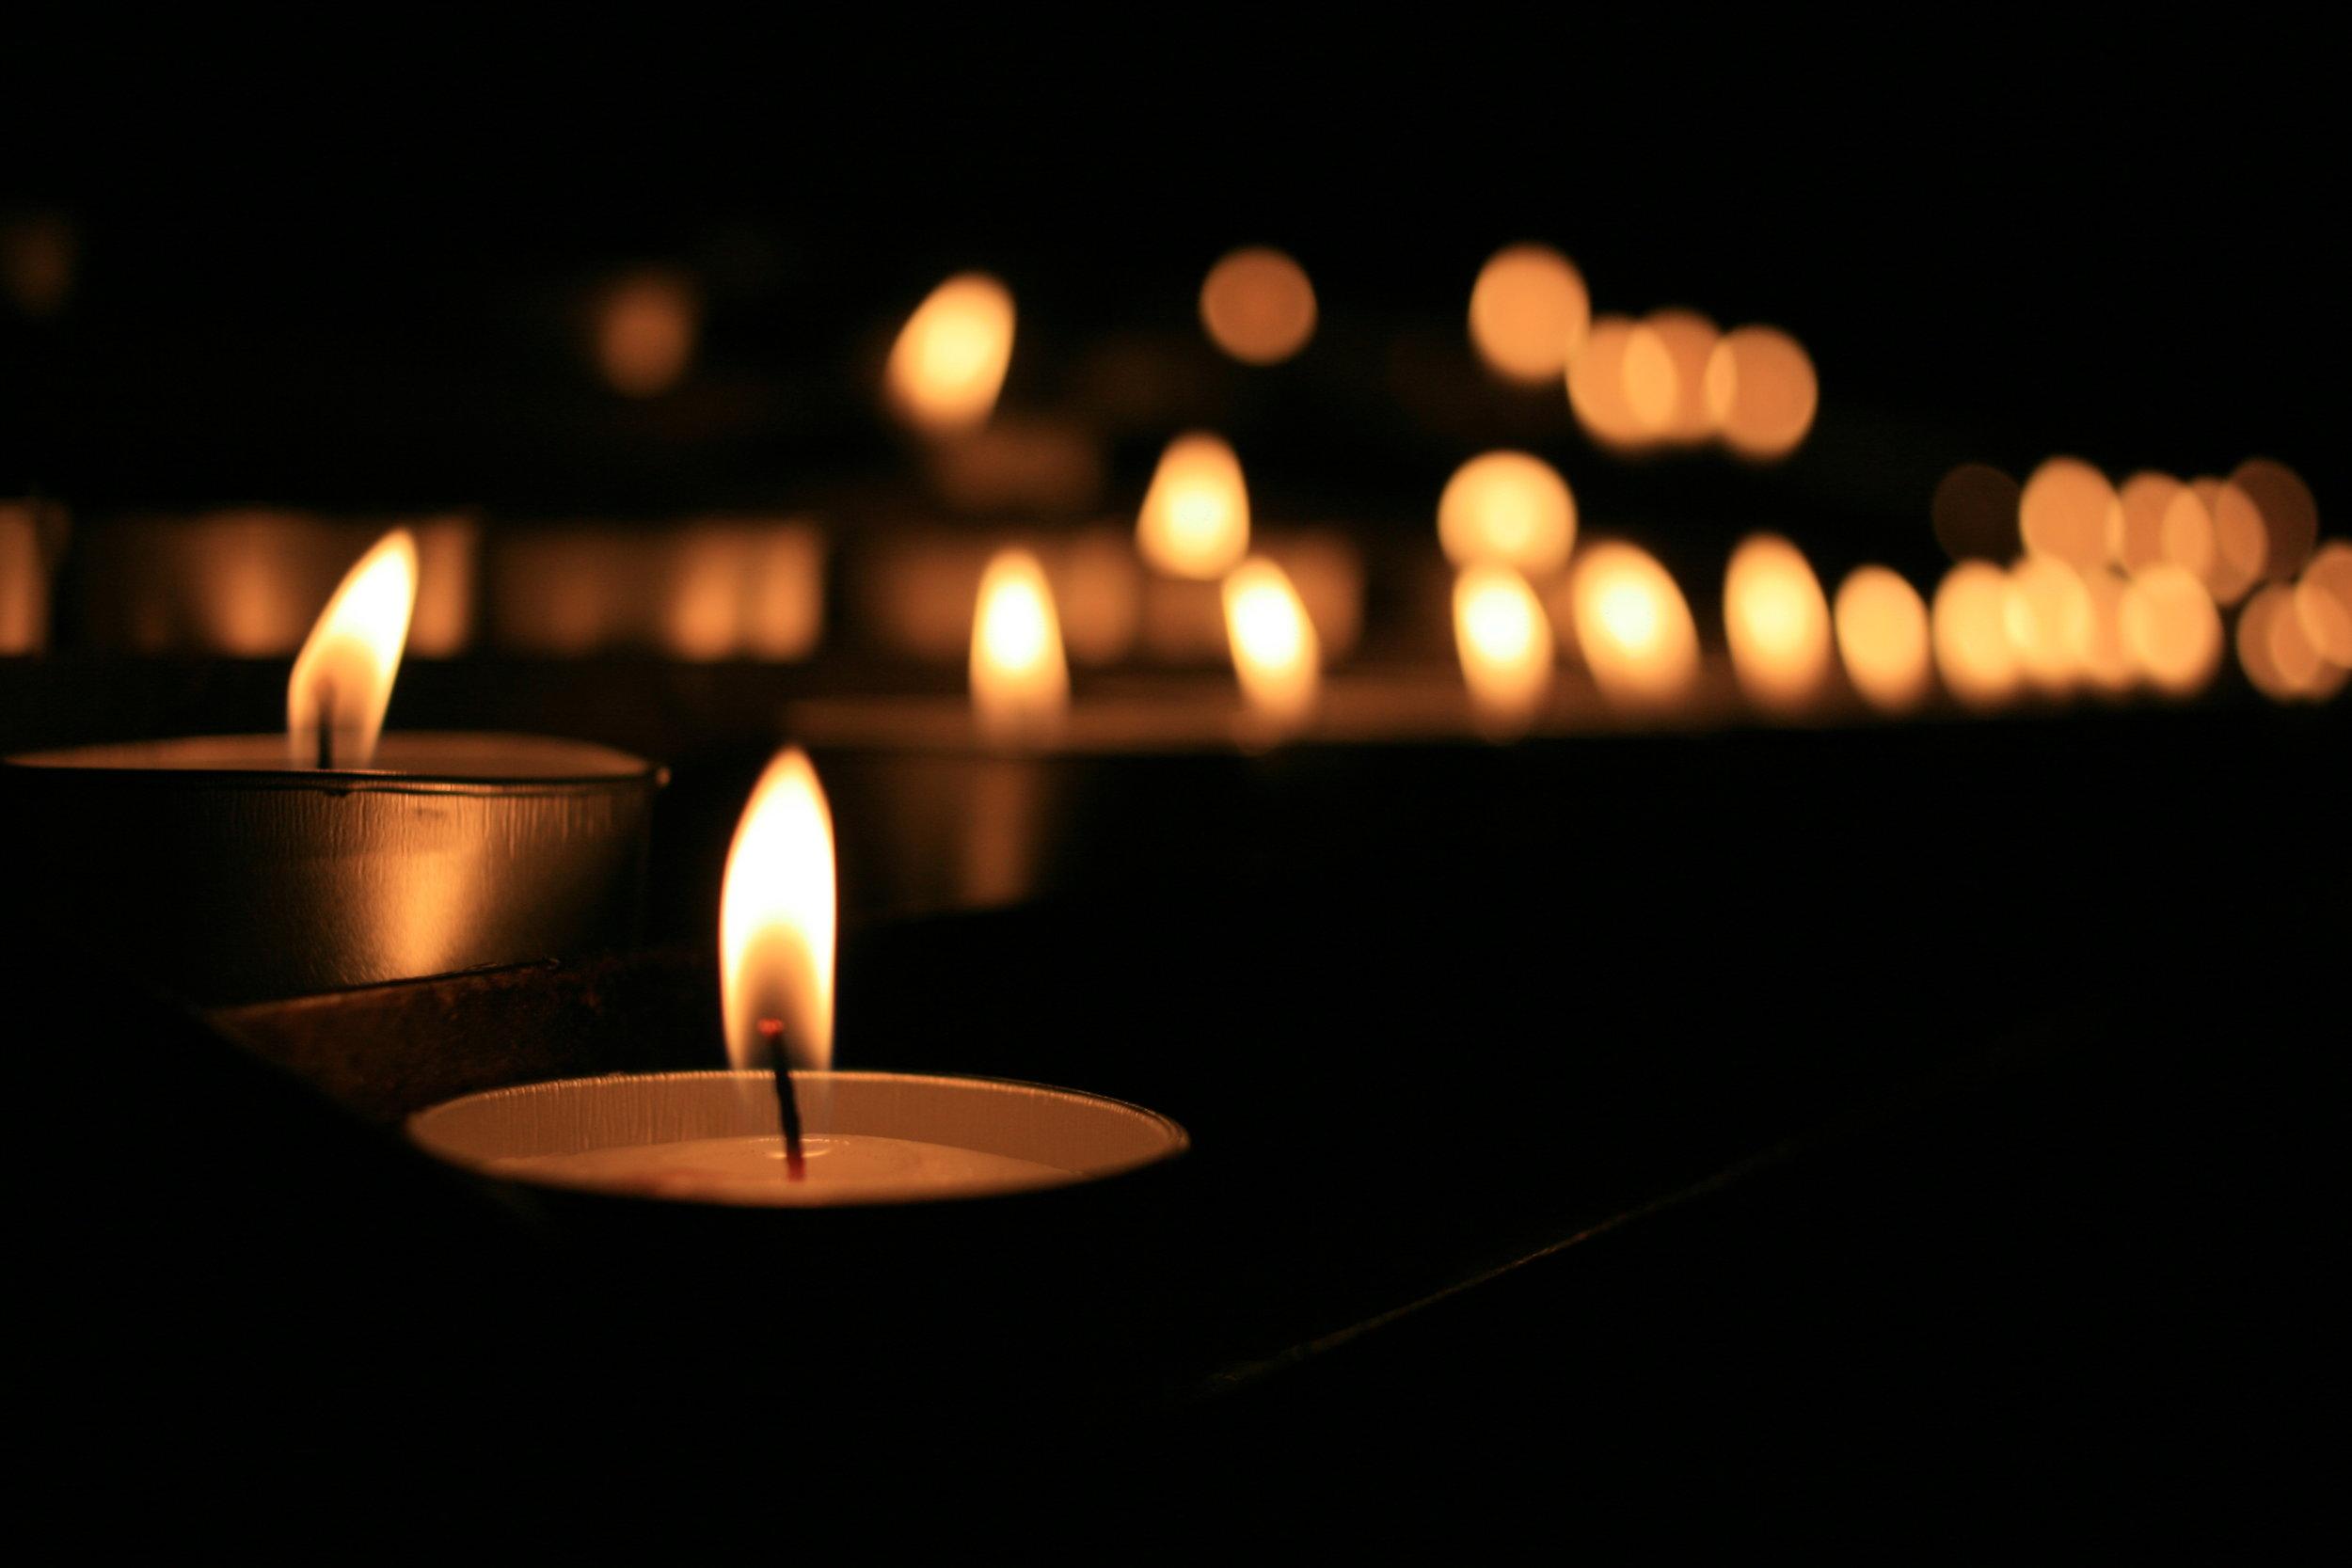 325607-candles-lights.jpg